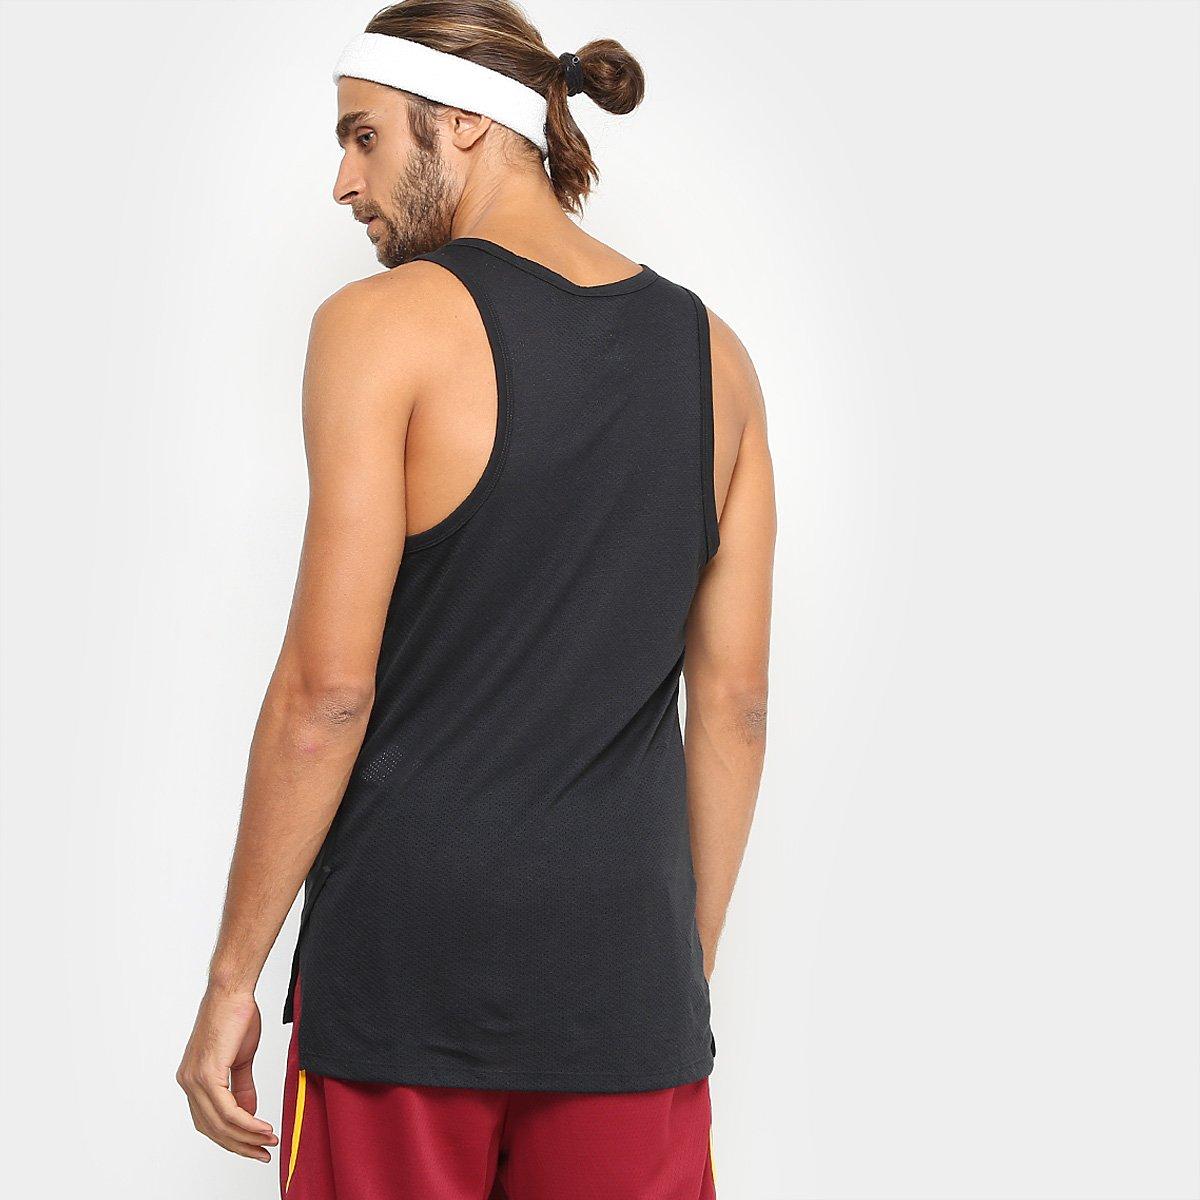 b3de857911 ... Foto 2 - Regata Nike Elite Top Masculina ...